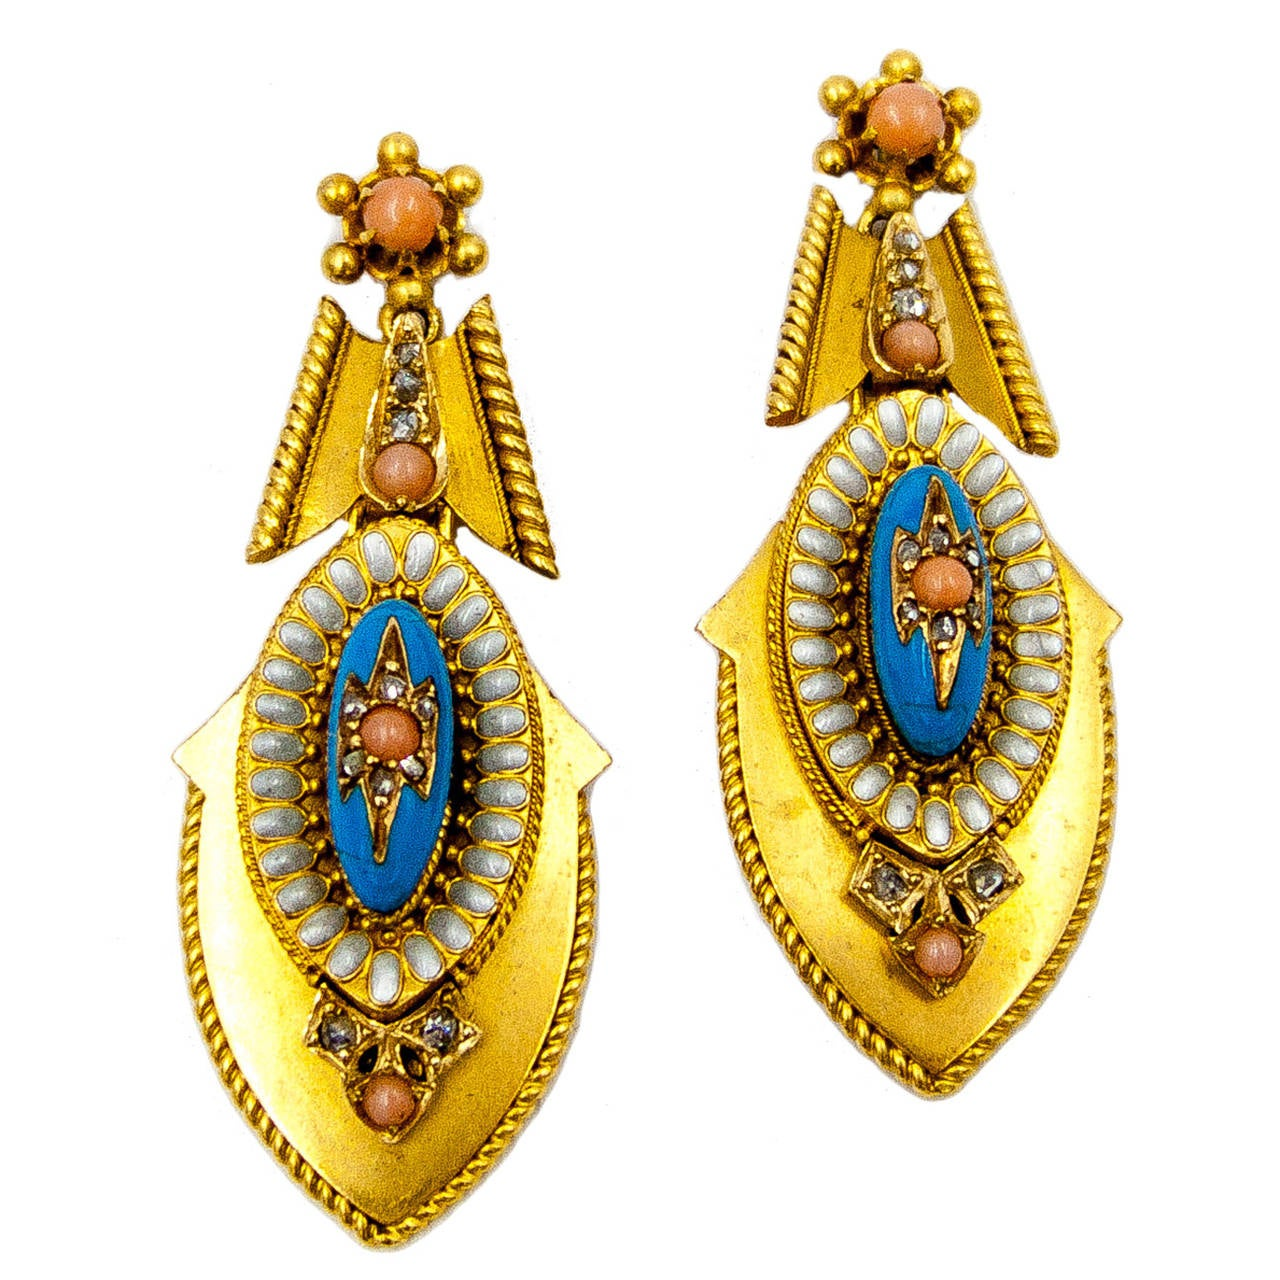 ImpressIve Victorian Enamel Coral Gold Pendant Earrings 1